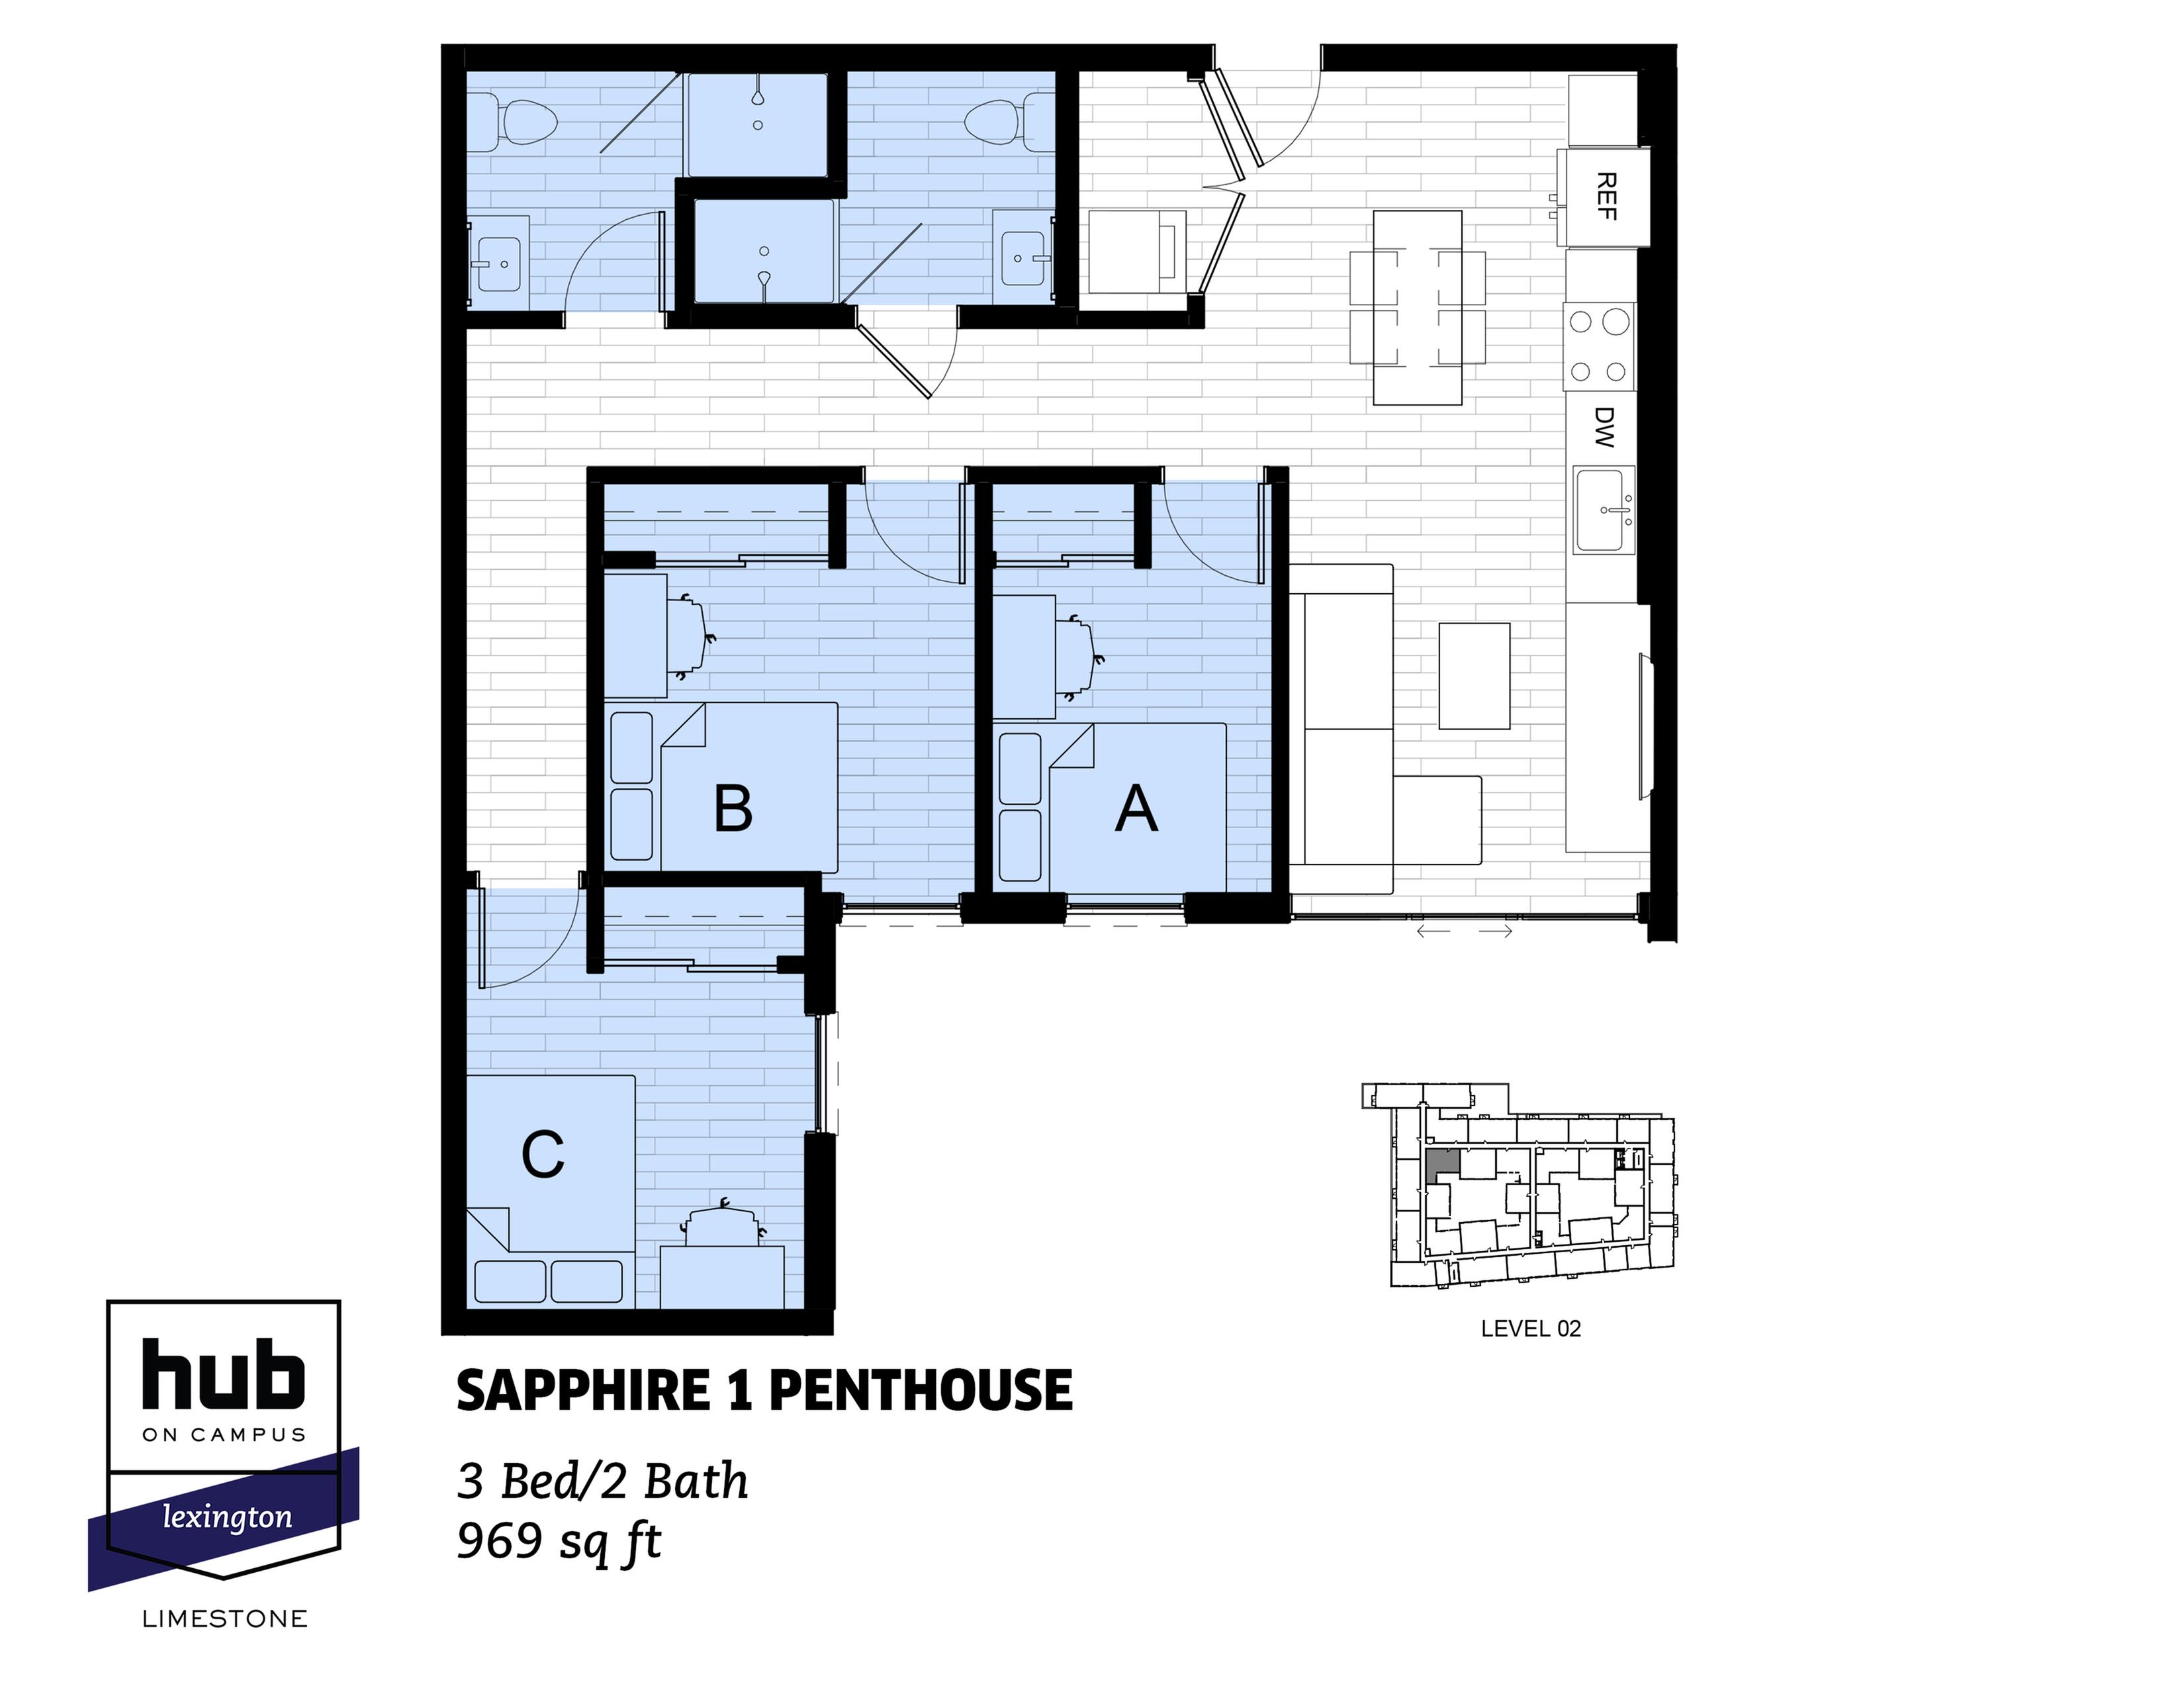 Sapphire 1 Penthouse